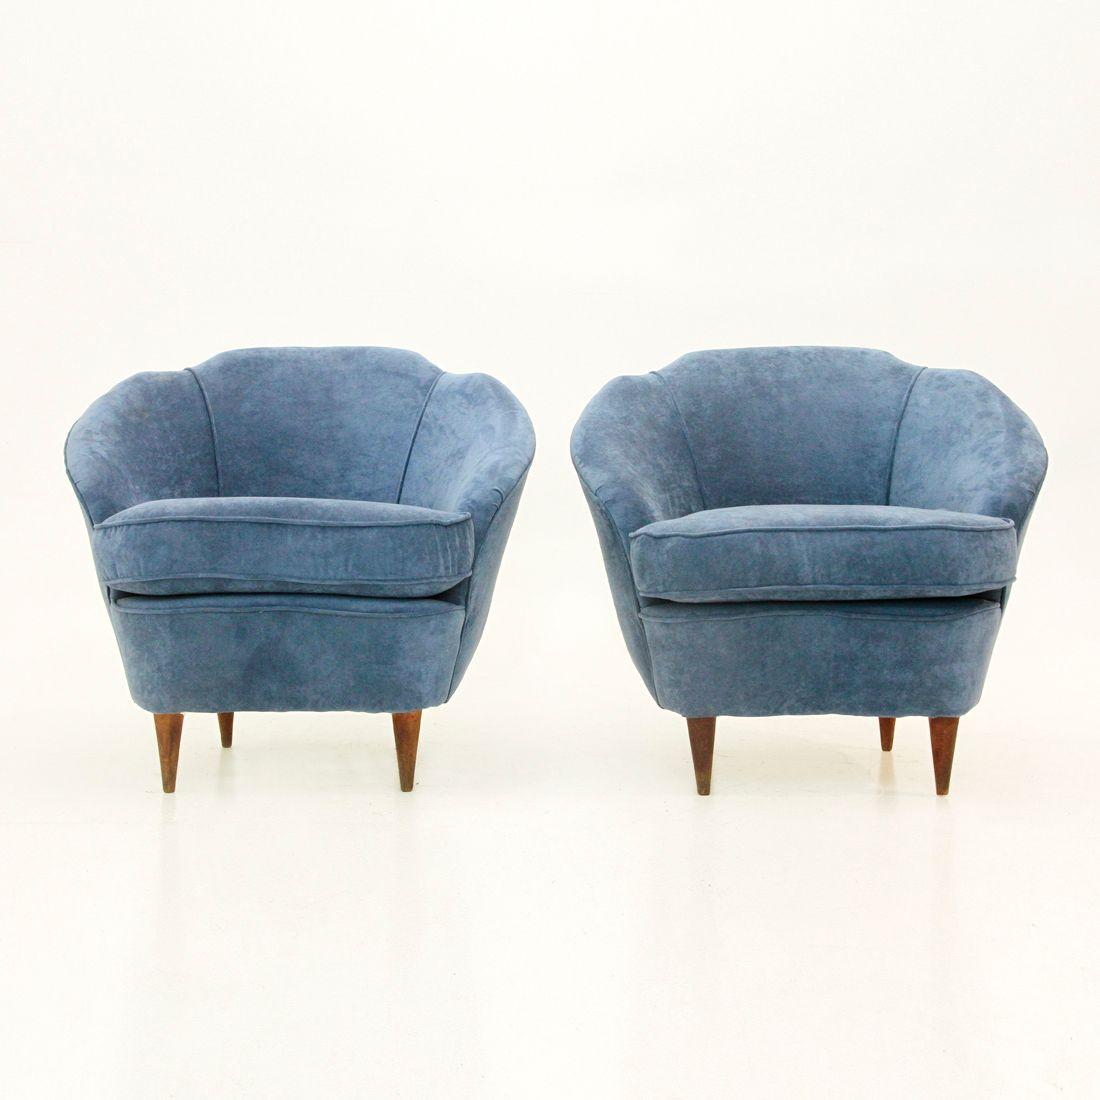 italienische mid century samt sessel 1950er 2er set bei pamono kaufen. Black Bedroom Furniture Sets. Home Design Ideas